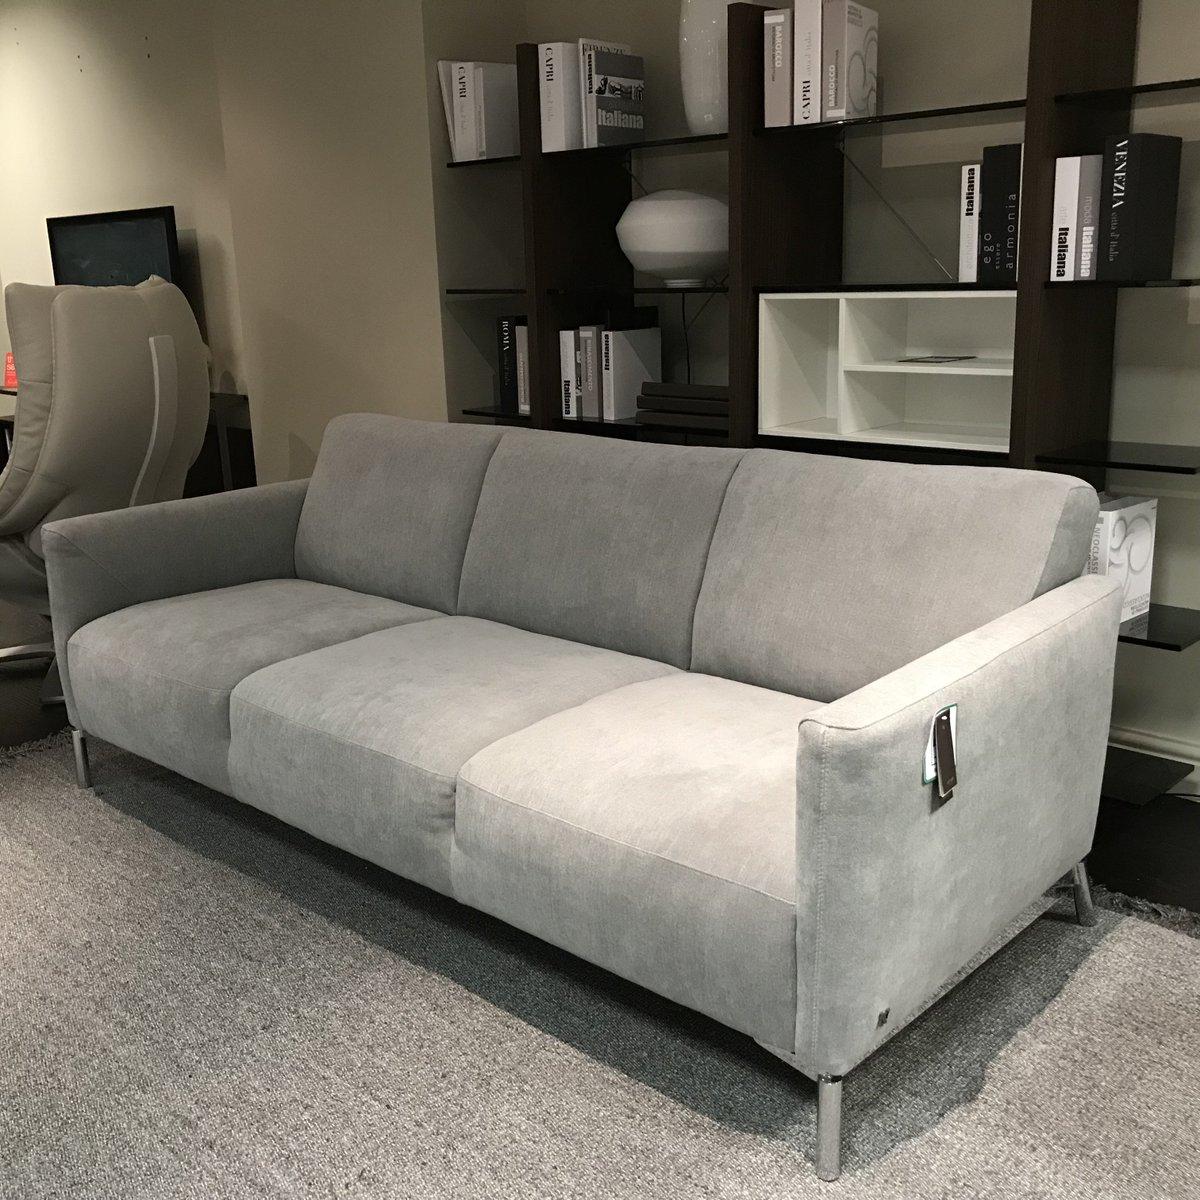 Natuzzi Tratto Large Sofa Now Available